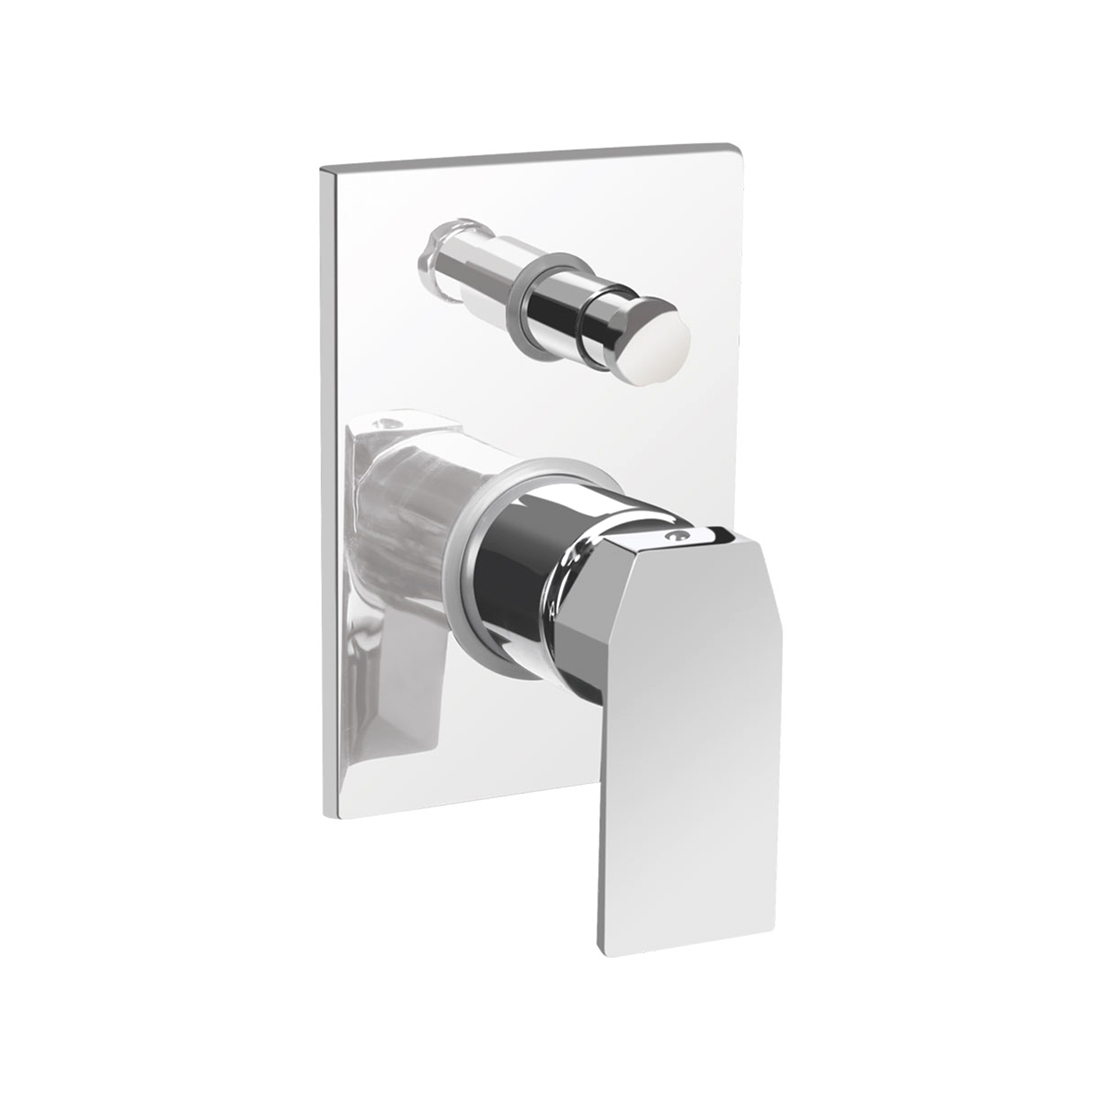 Kerovit Qua KB1011014 Single Lever 2-Inlet Concealed Bath and Shower Mixer Trim